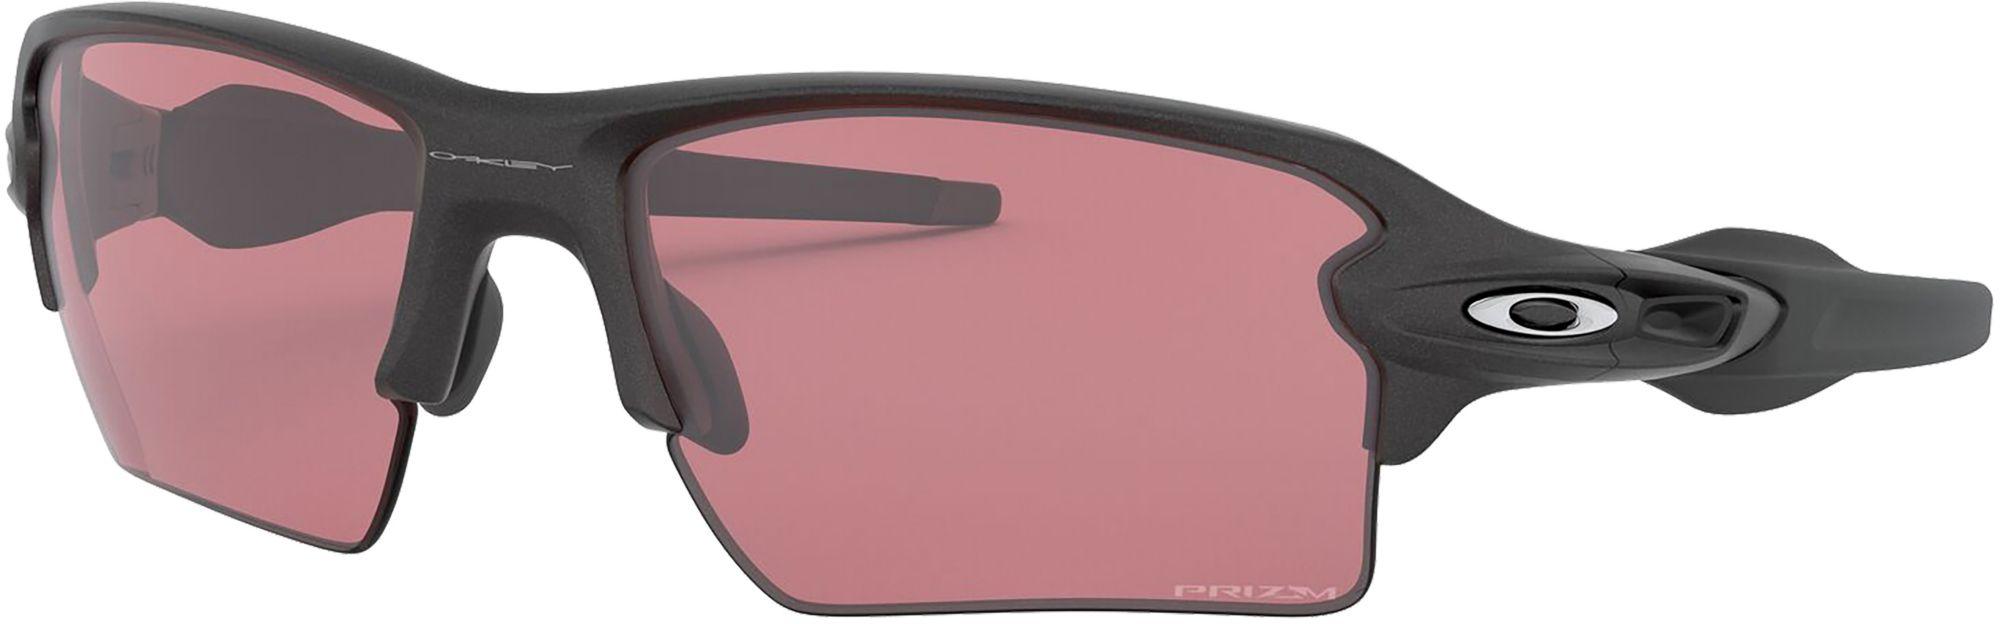 Best Sunglasses in Golf - Oakley Flak 2.0 Prizm Golf